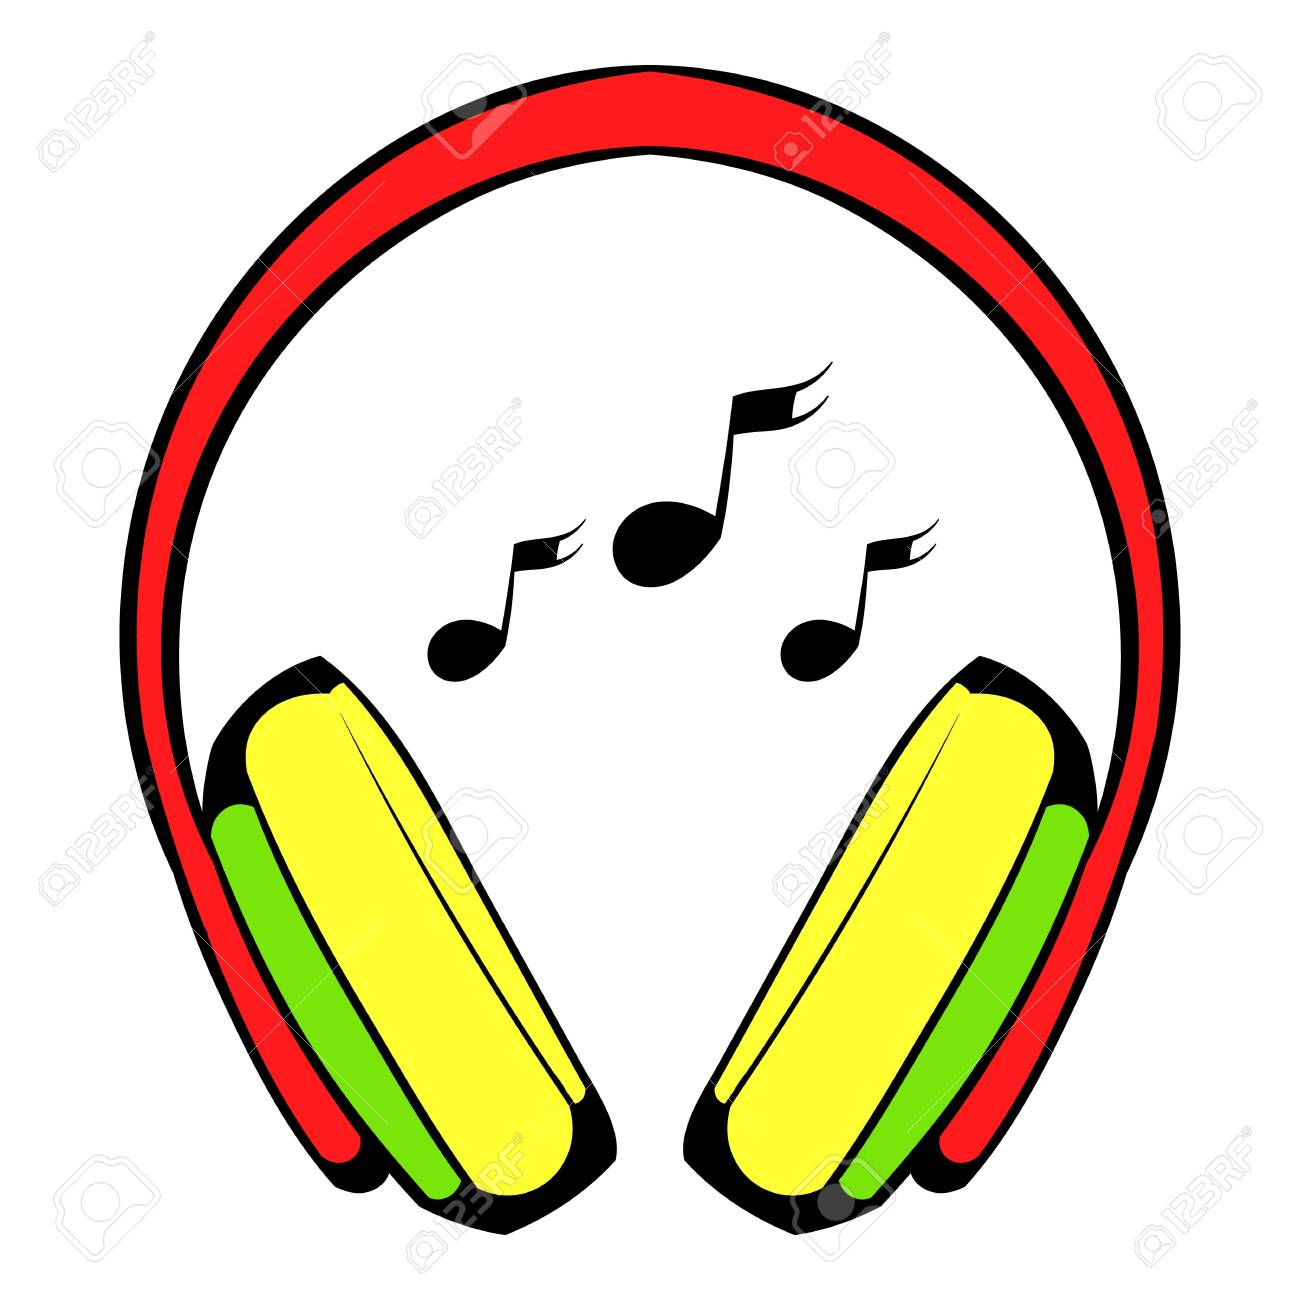 Kopfhörer-Symbol, Icon-Cartoon Lizenzfrei Nutzbare Vektorgrafiken ...